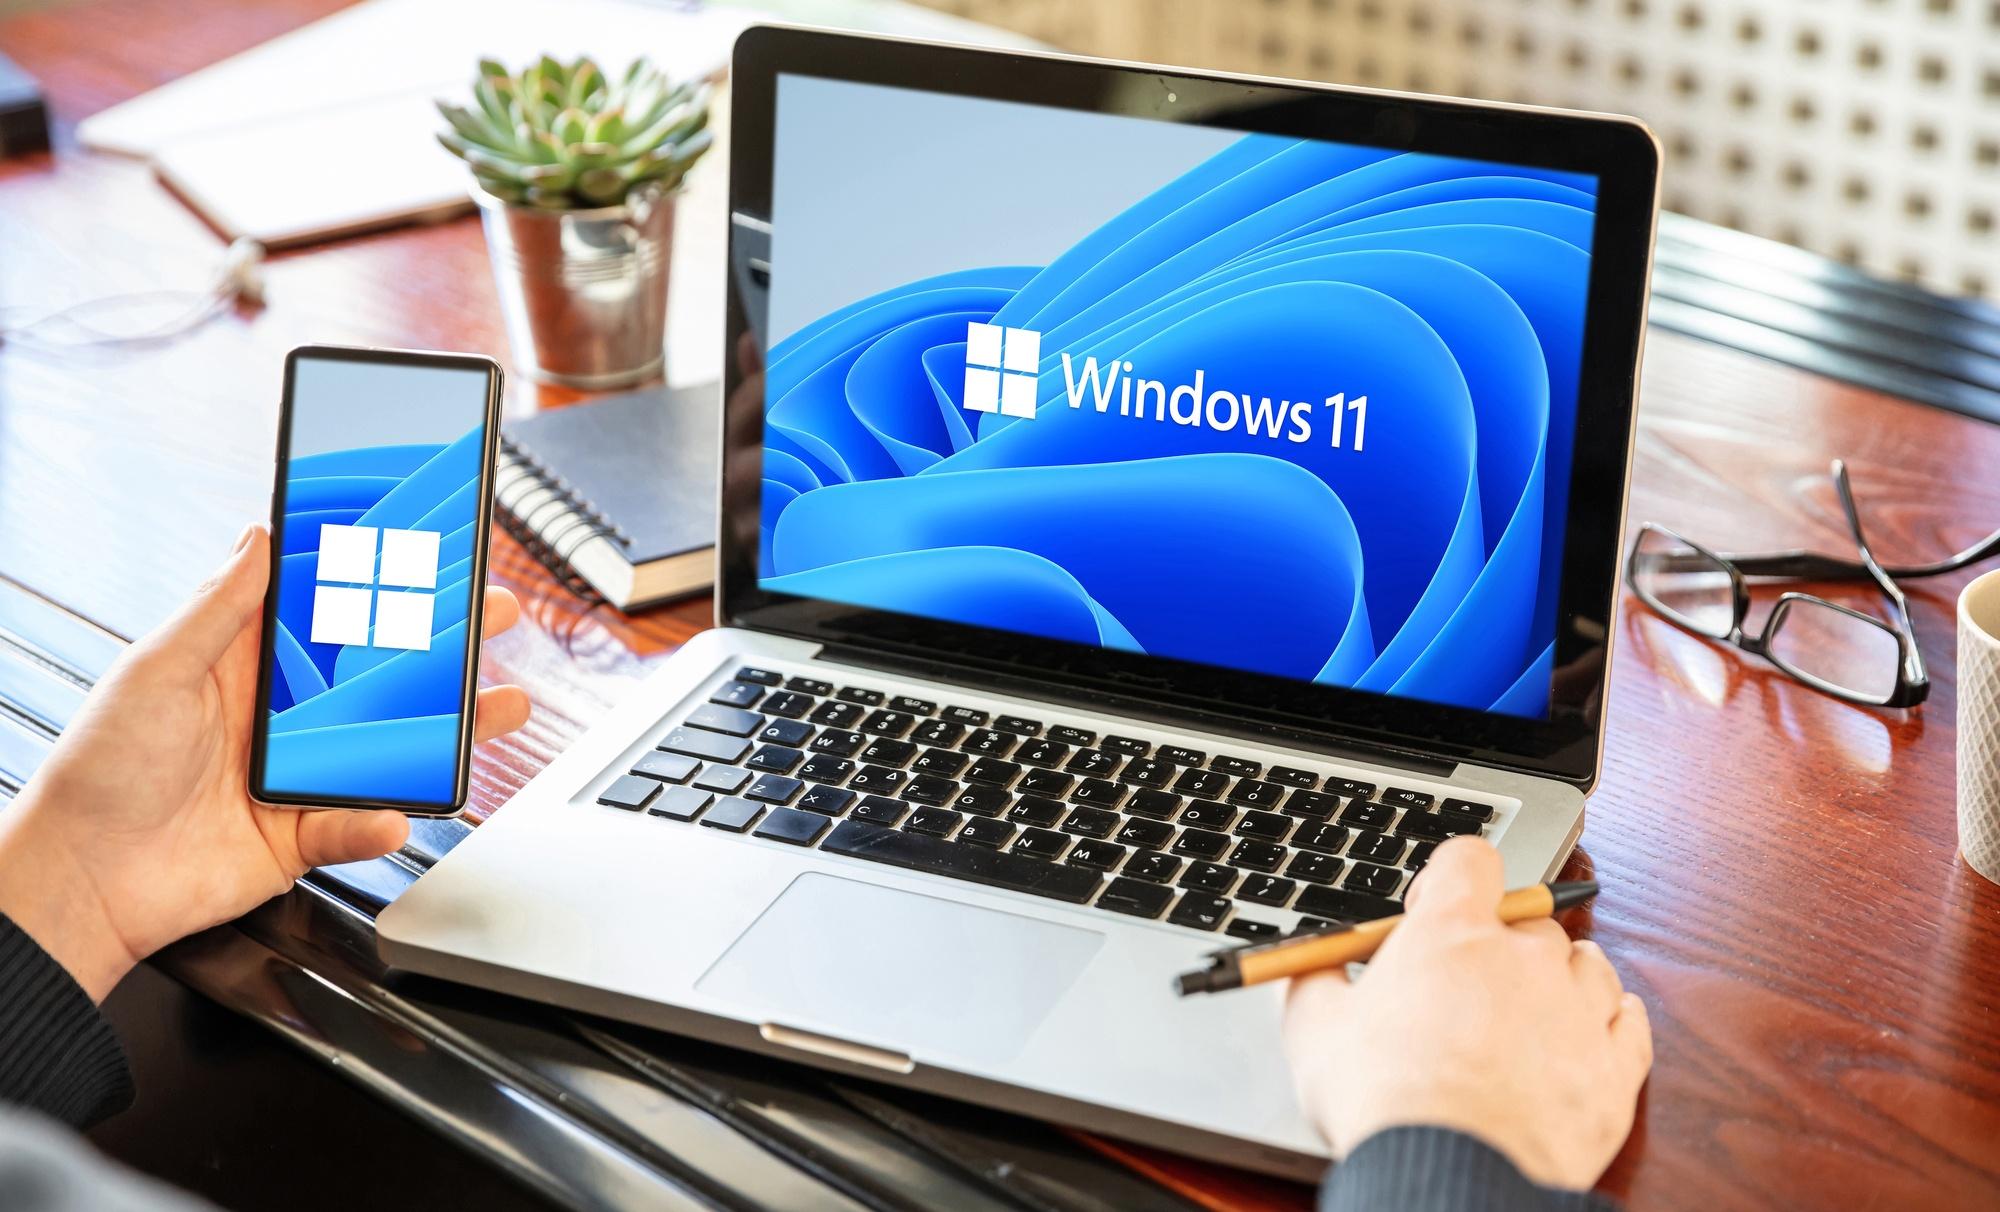 Don't Take the Windows 11 Upgrade (Yet)